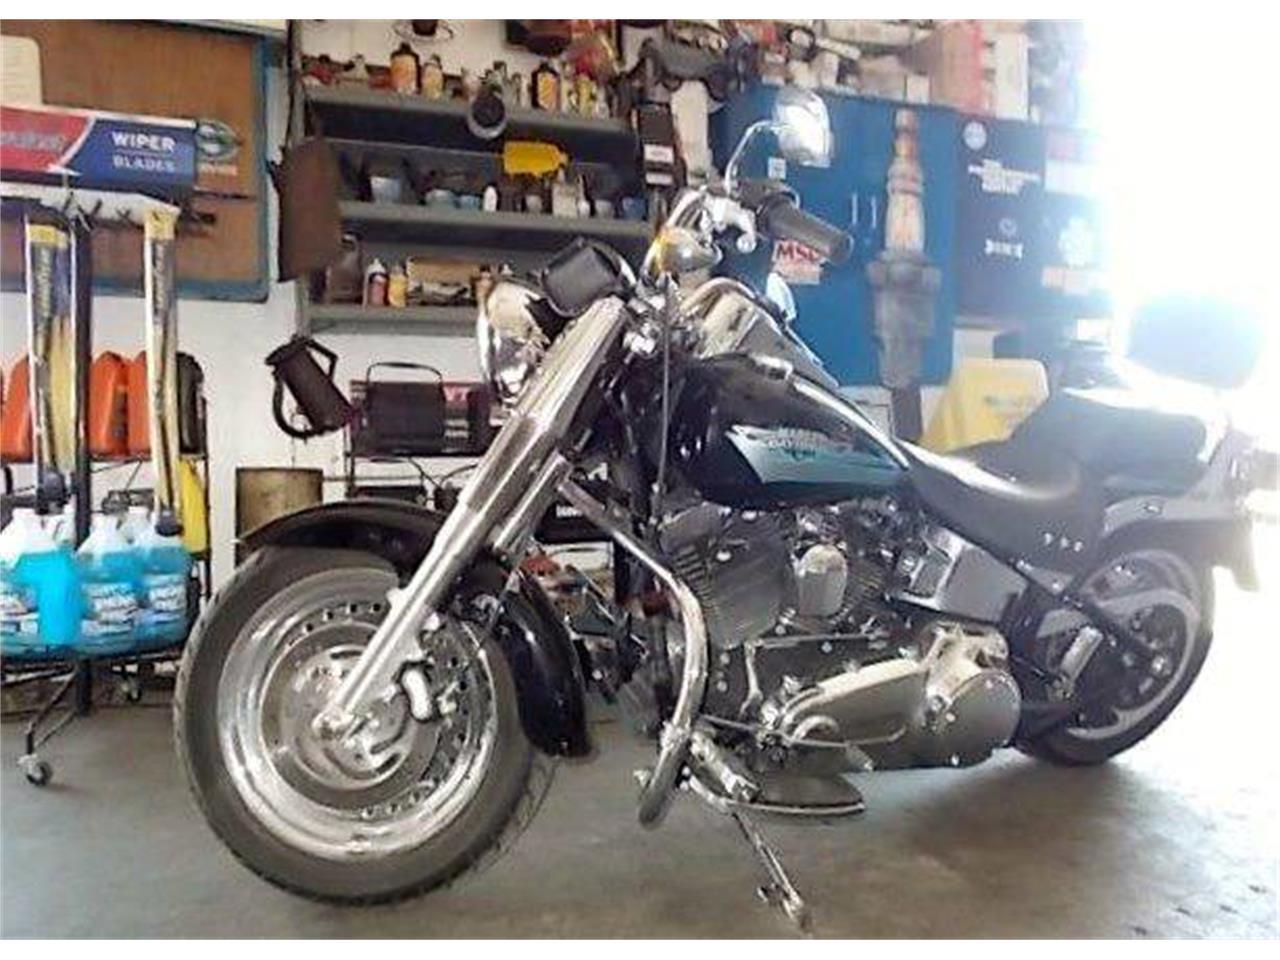 2010 Harley-Davidson Fat Boy (CC-1221734) for sale in Riverside, New Jersey